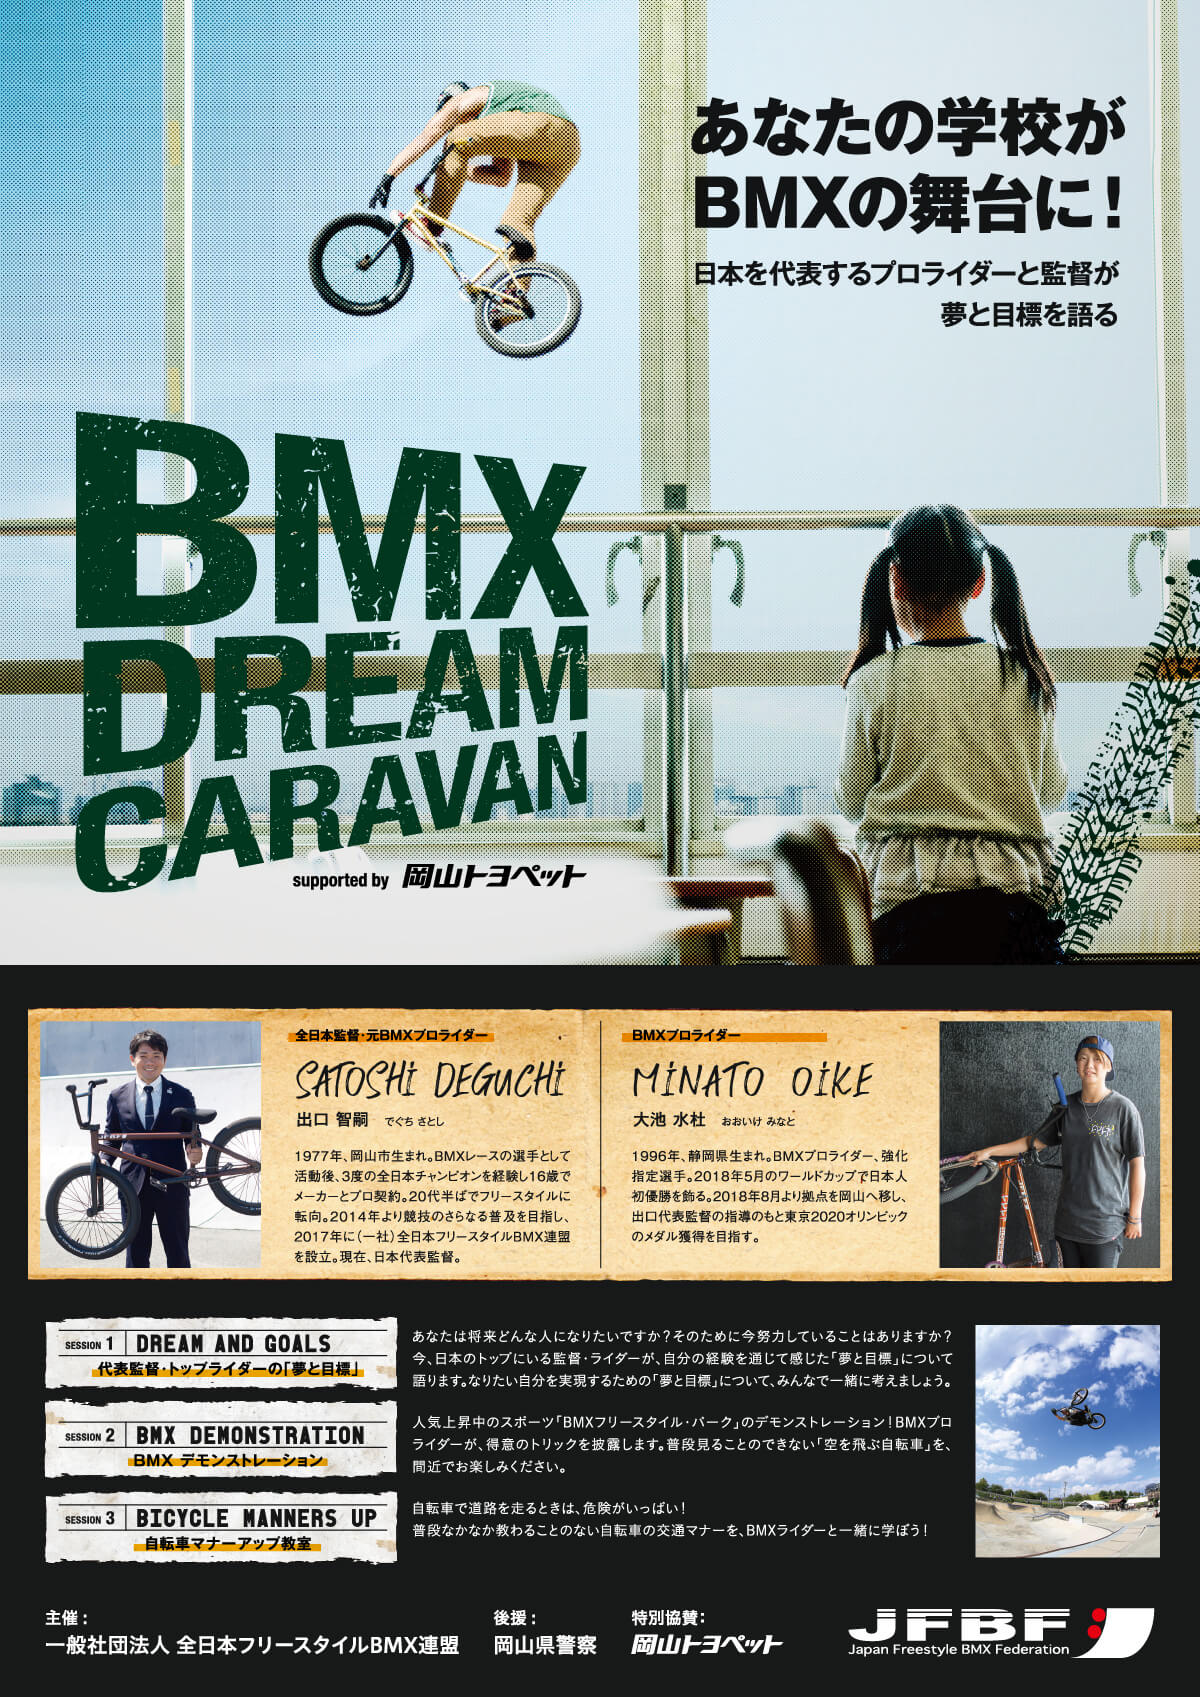 BMX DREAM CARAVAN